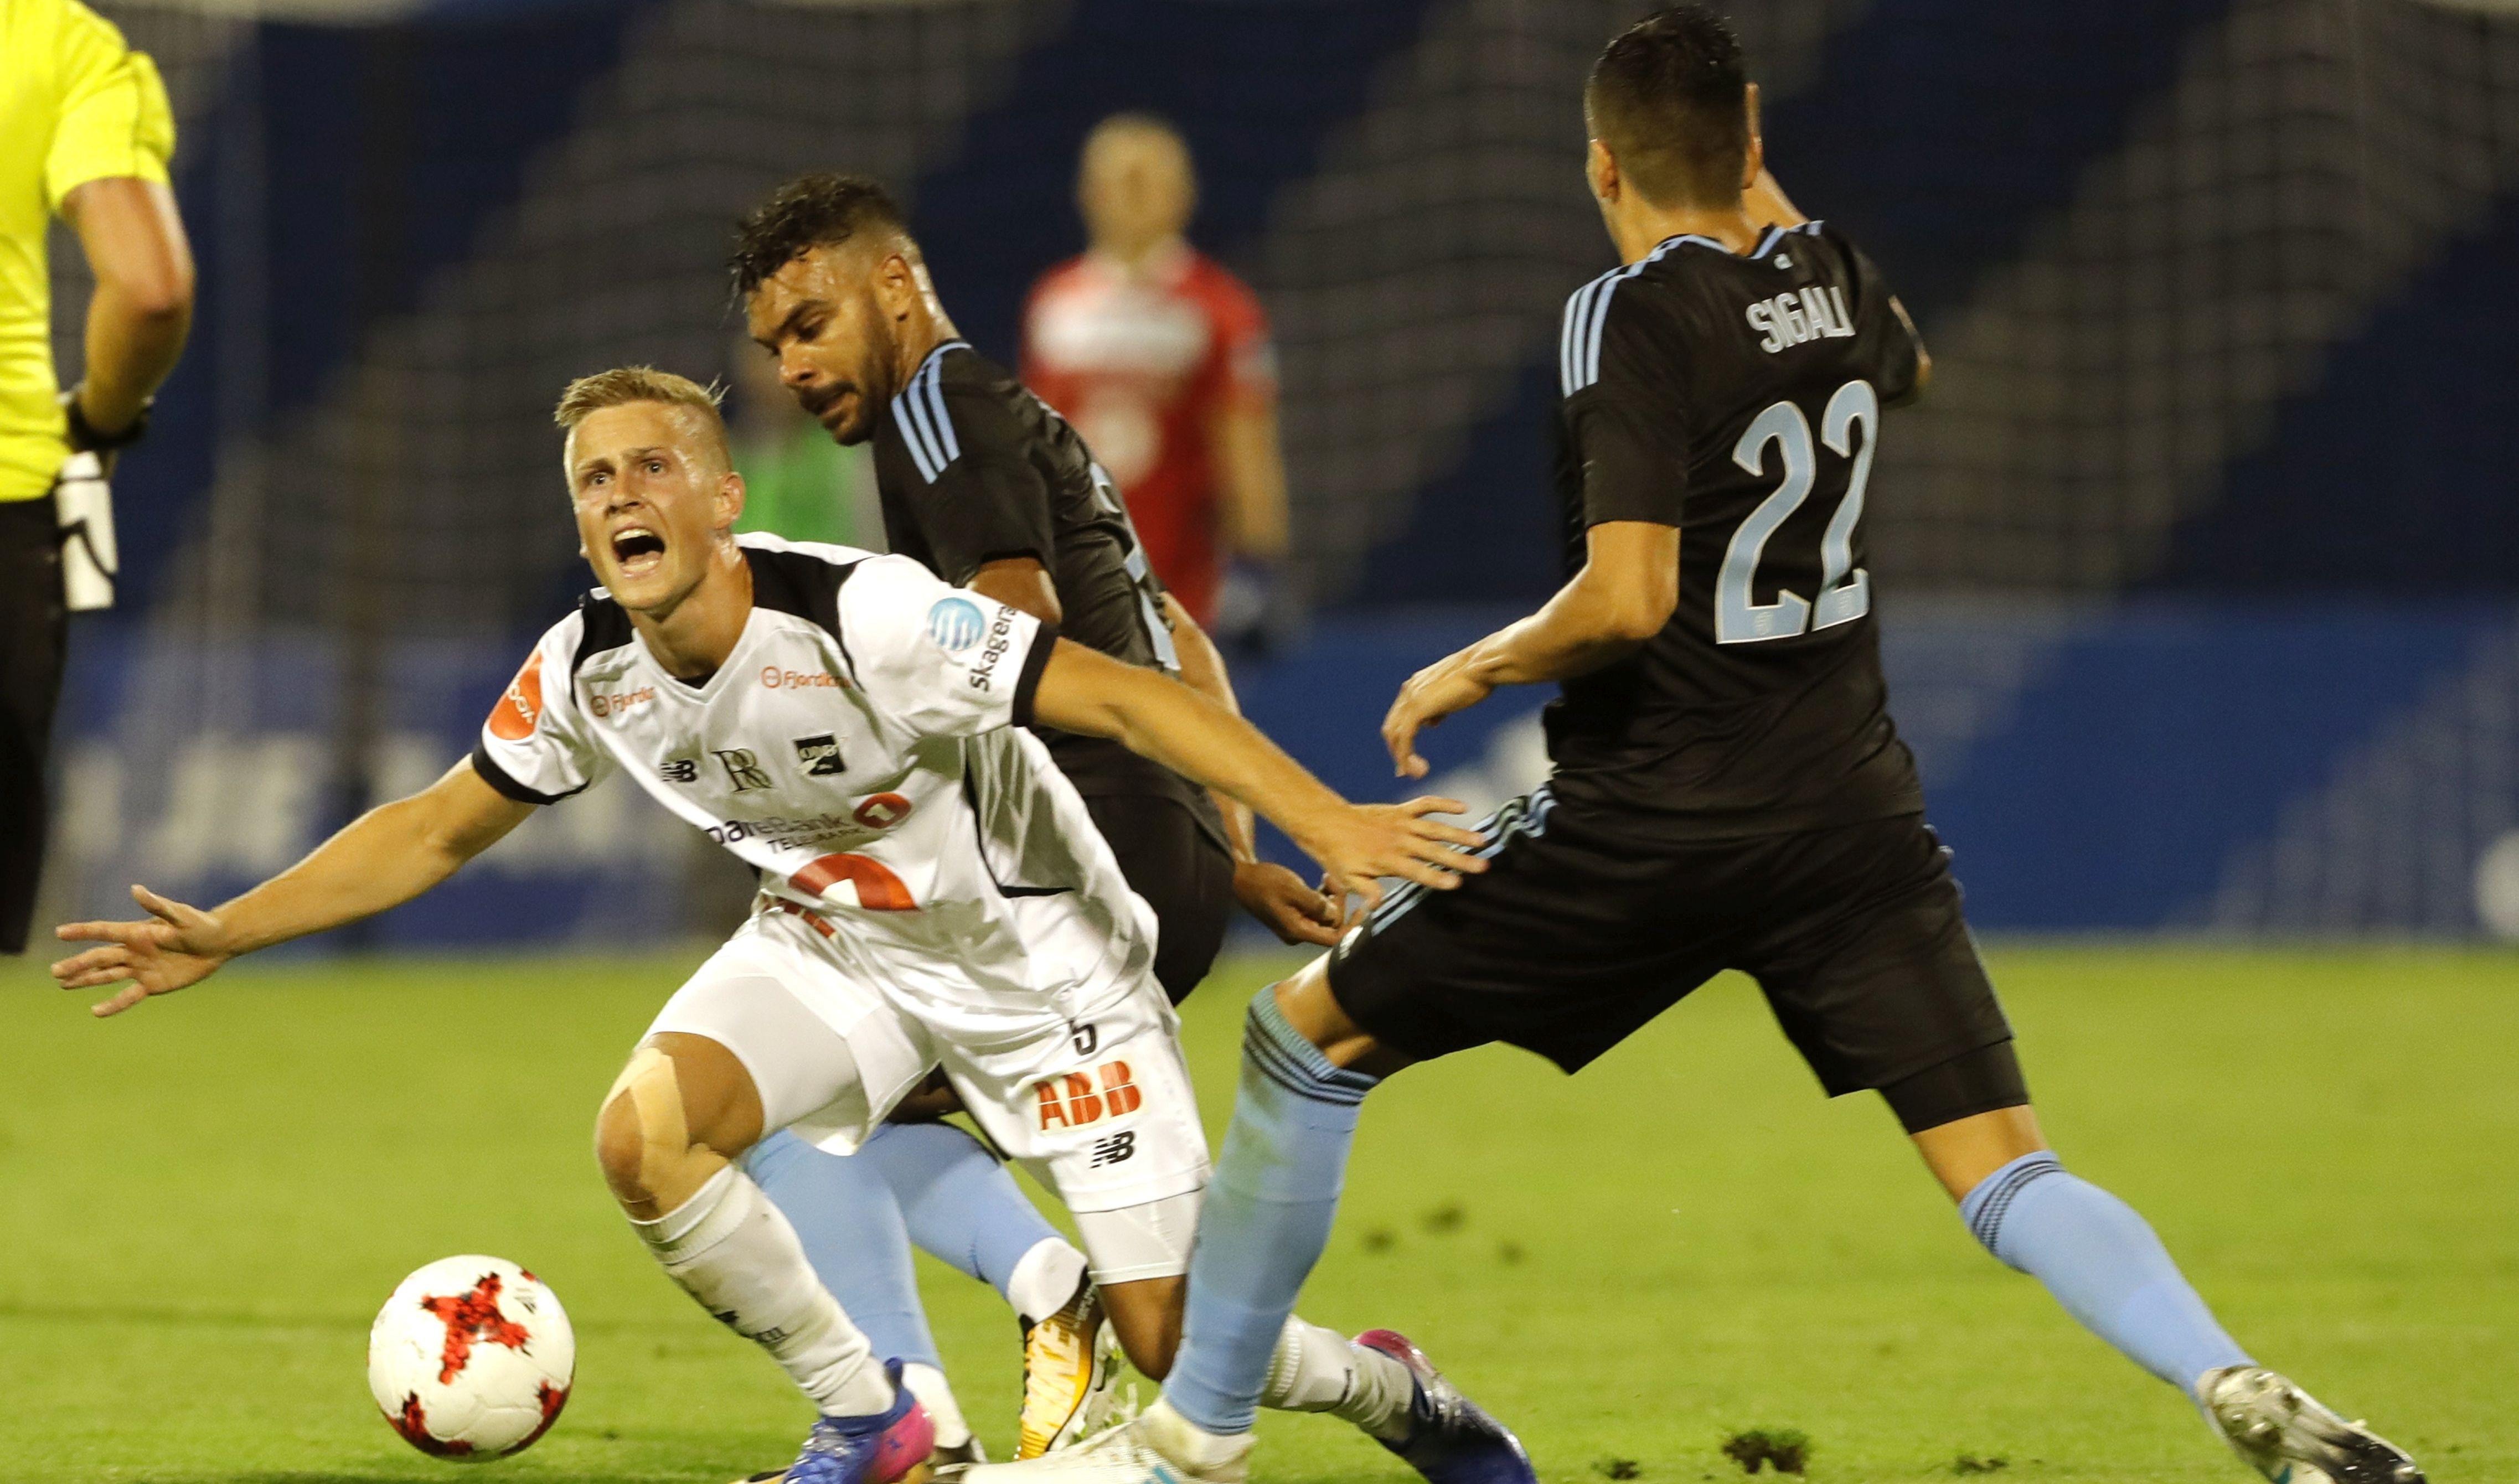 EL Dinamo – Odd 2-1